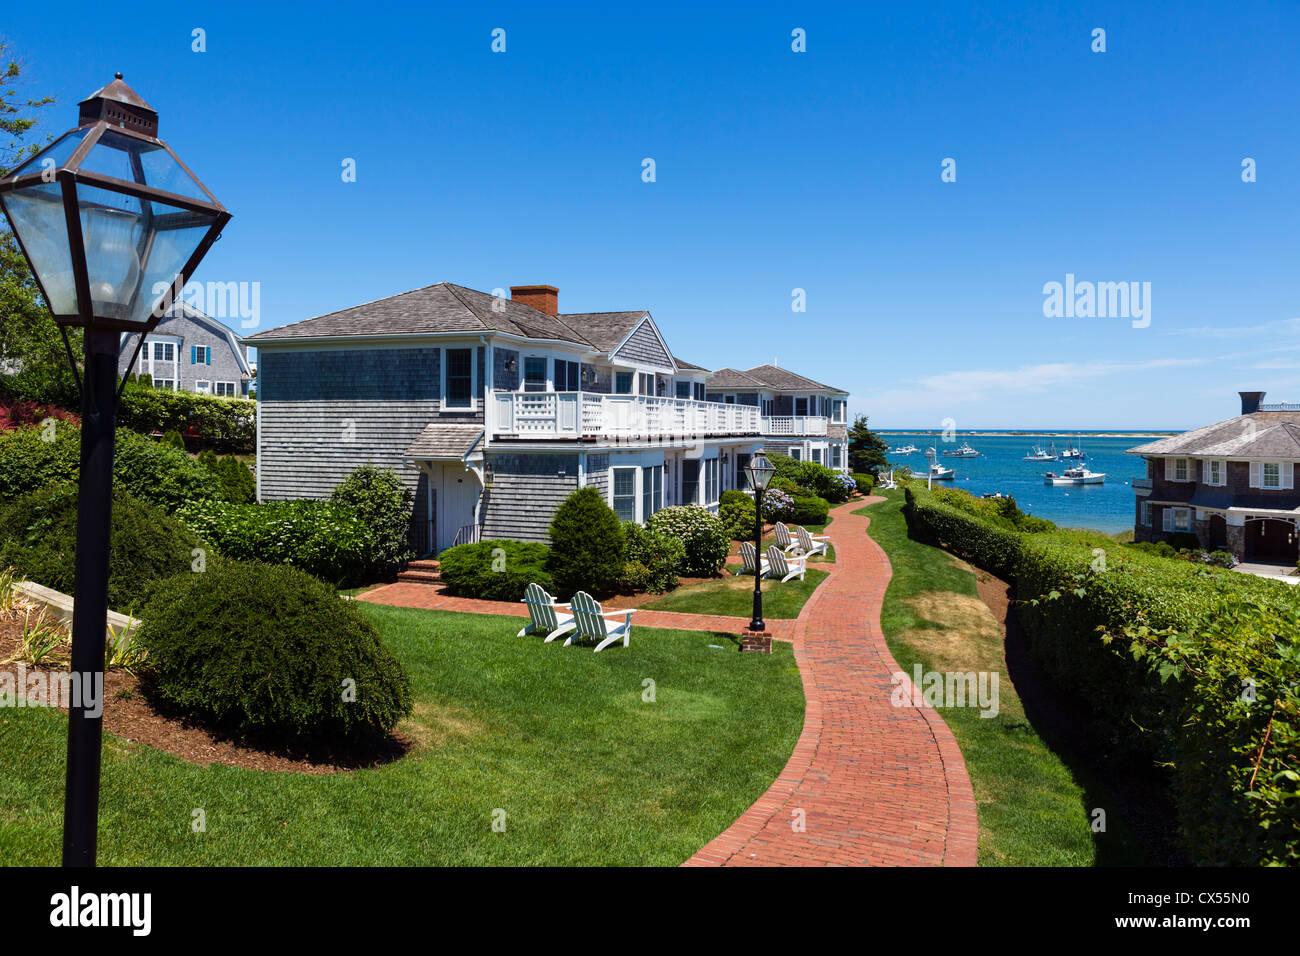 Beachfront apartments in Chatham, Cape Cod, Massachusetts, USA - Stock Image